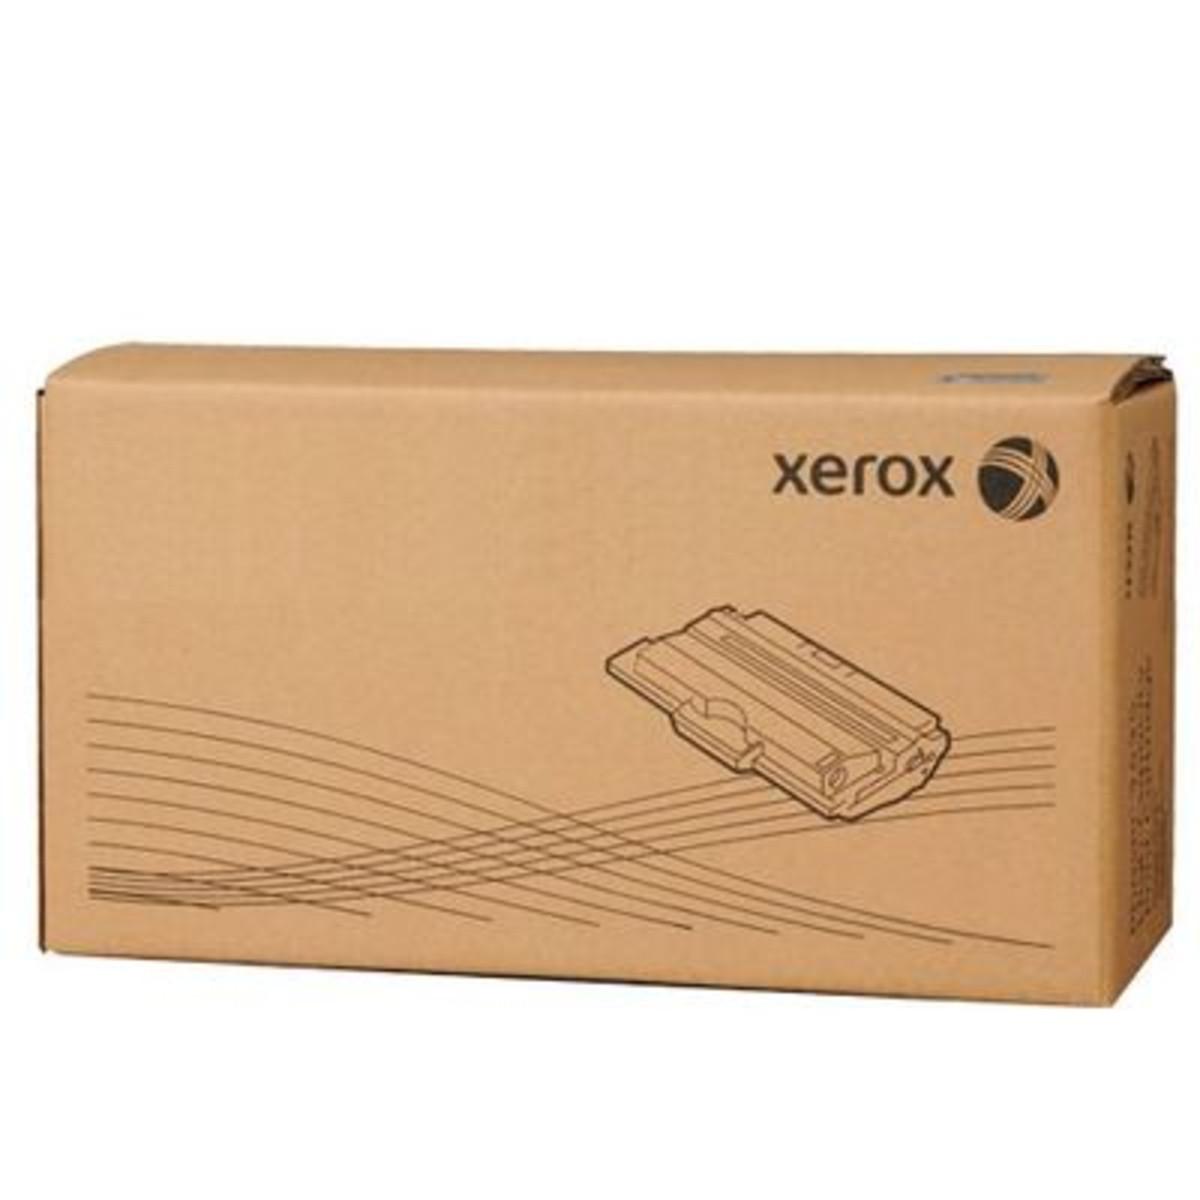 Xerox EL500268 Waste Toner Cartridge